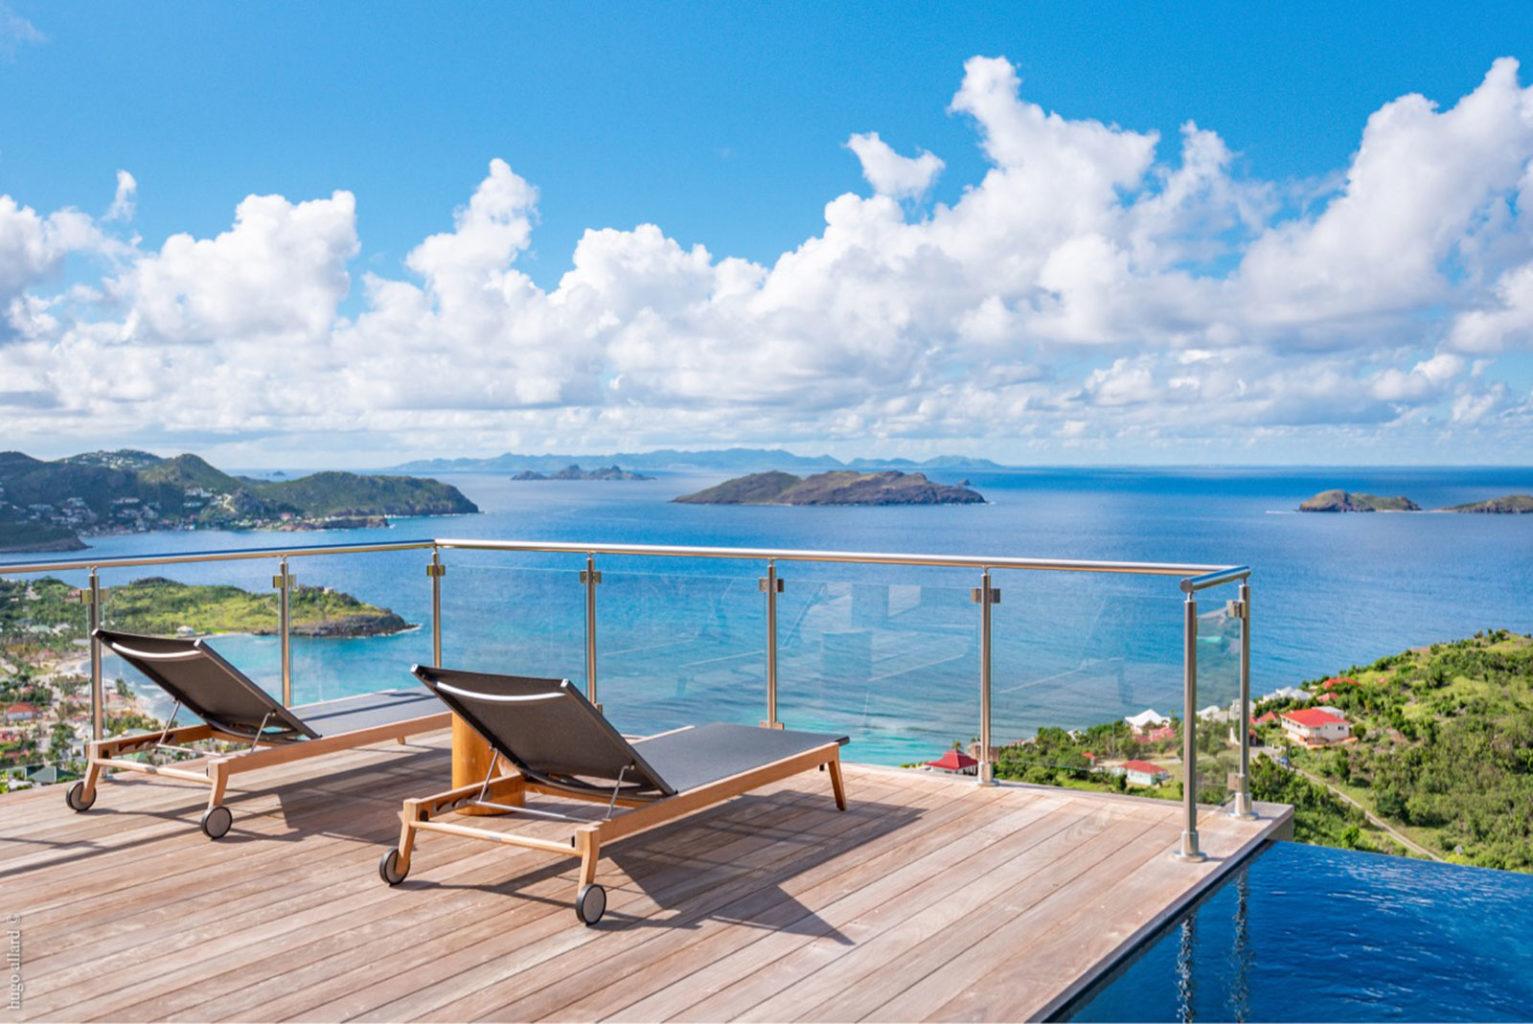 Villa Golden - 2 bedroom villa for rent St Barth Vitet with Gym room - Sea view